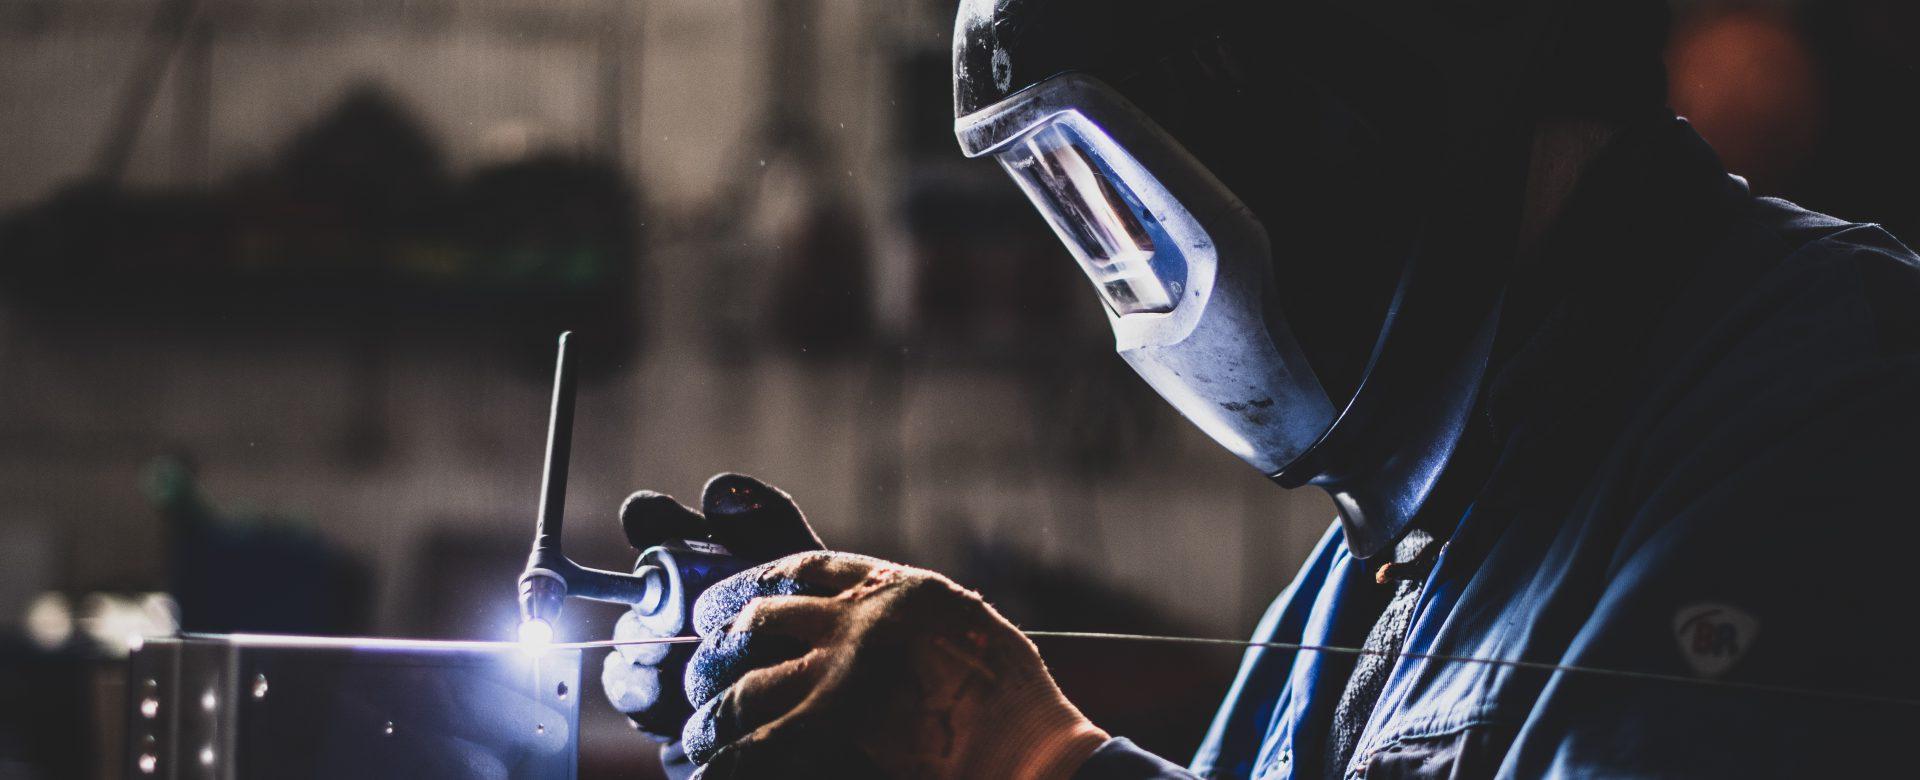 Vogel Metall GmbH & Co. KG